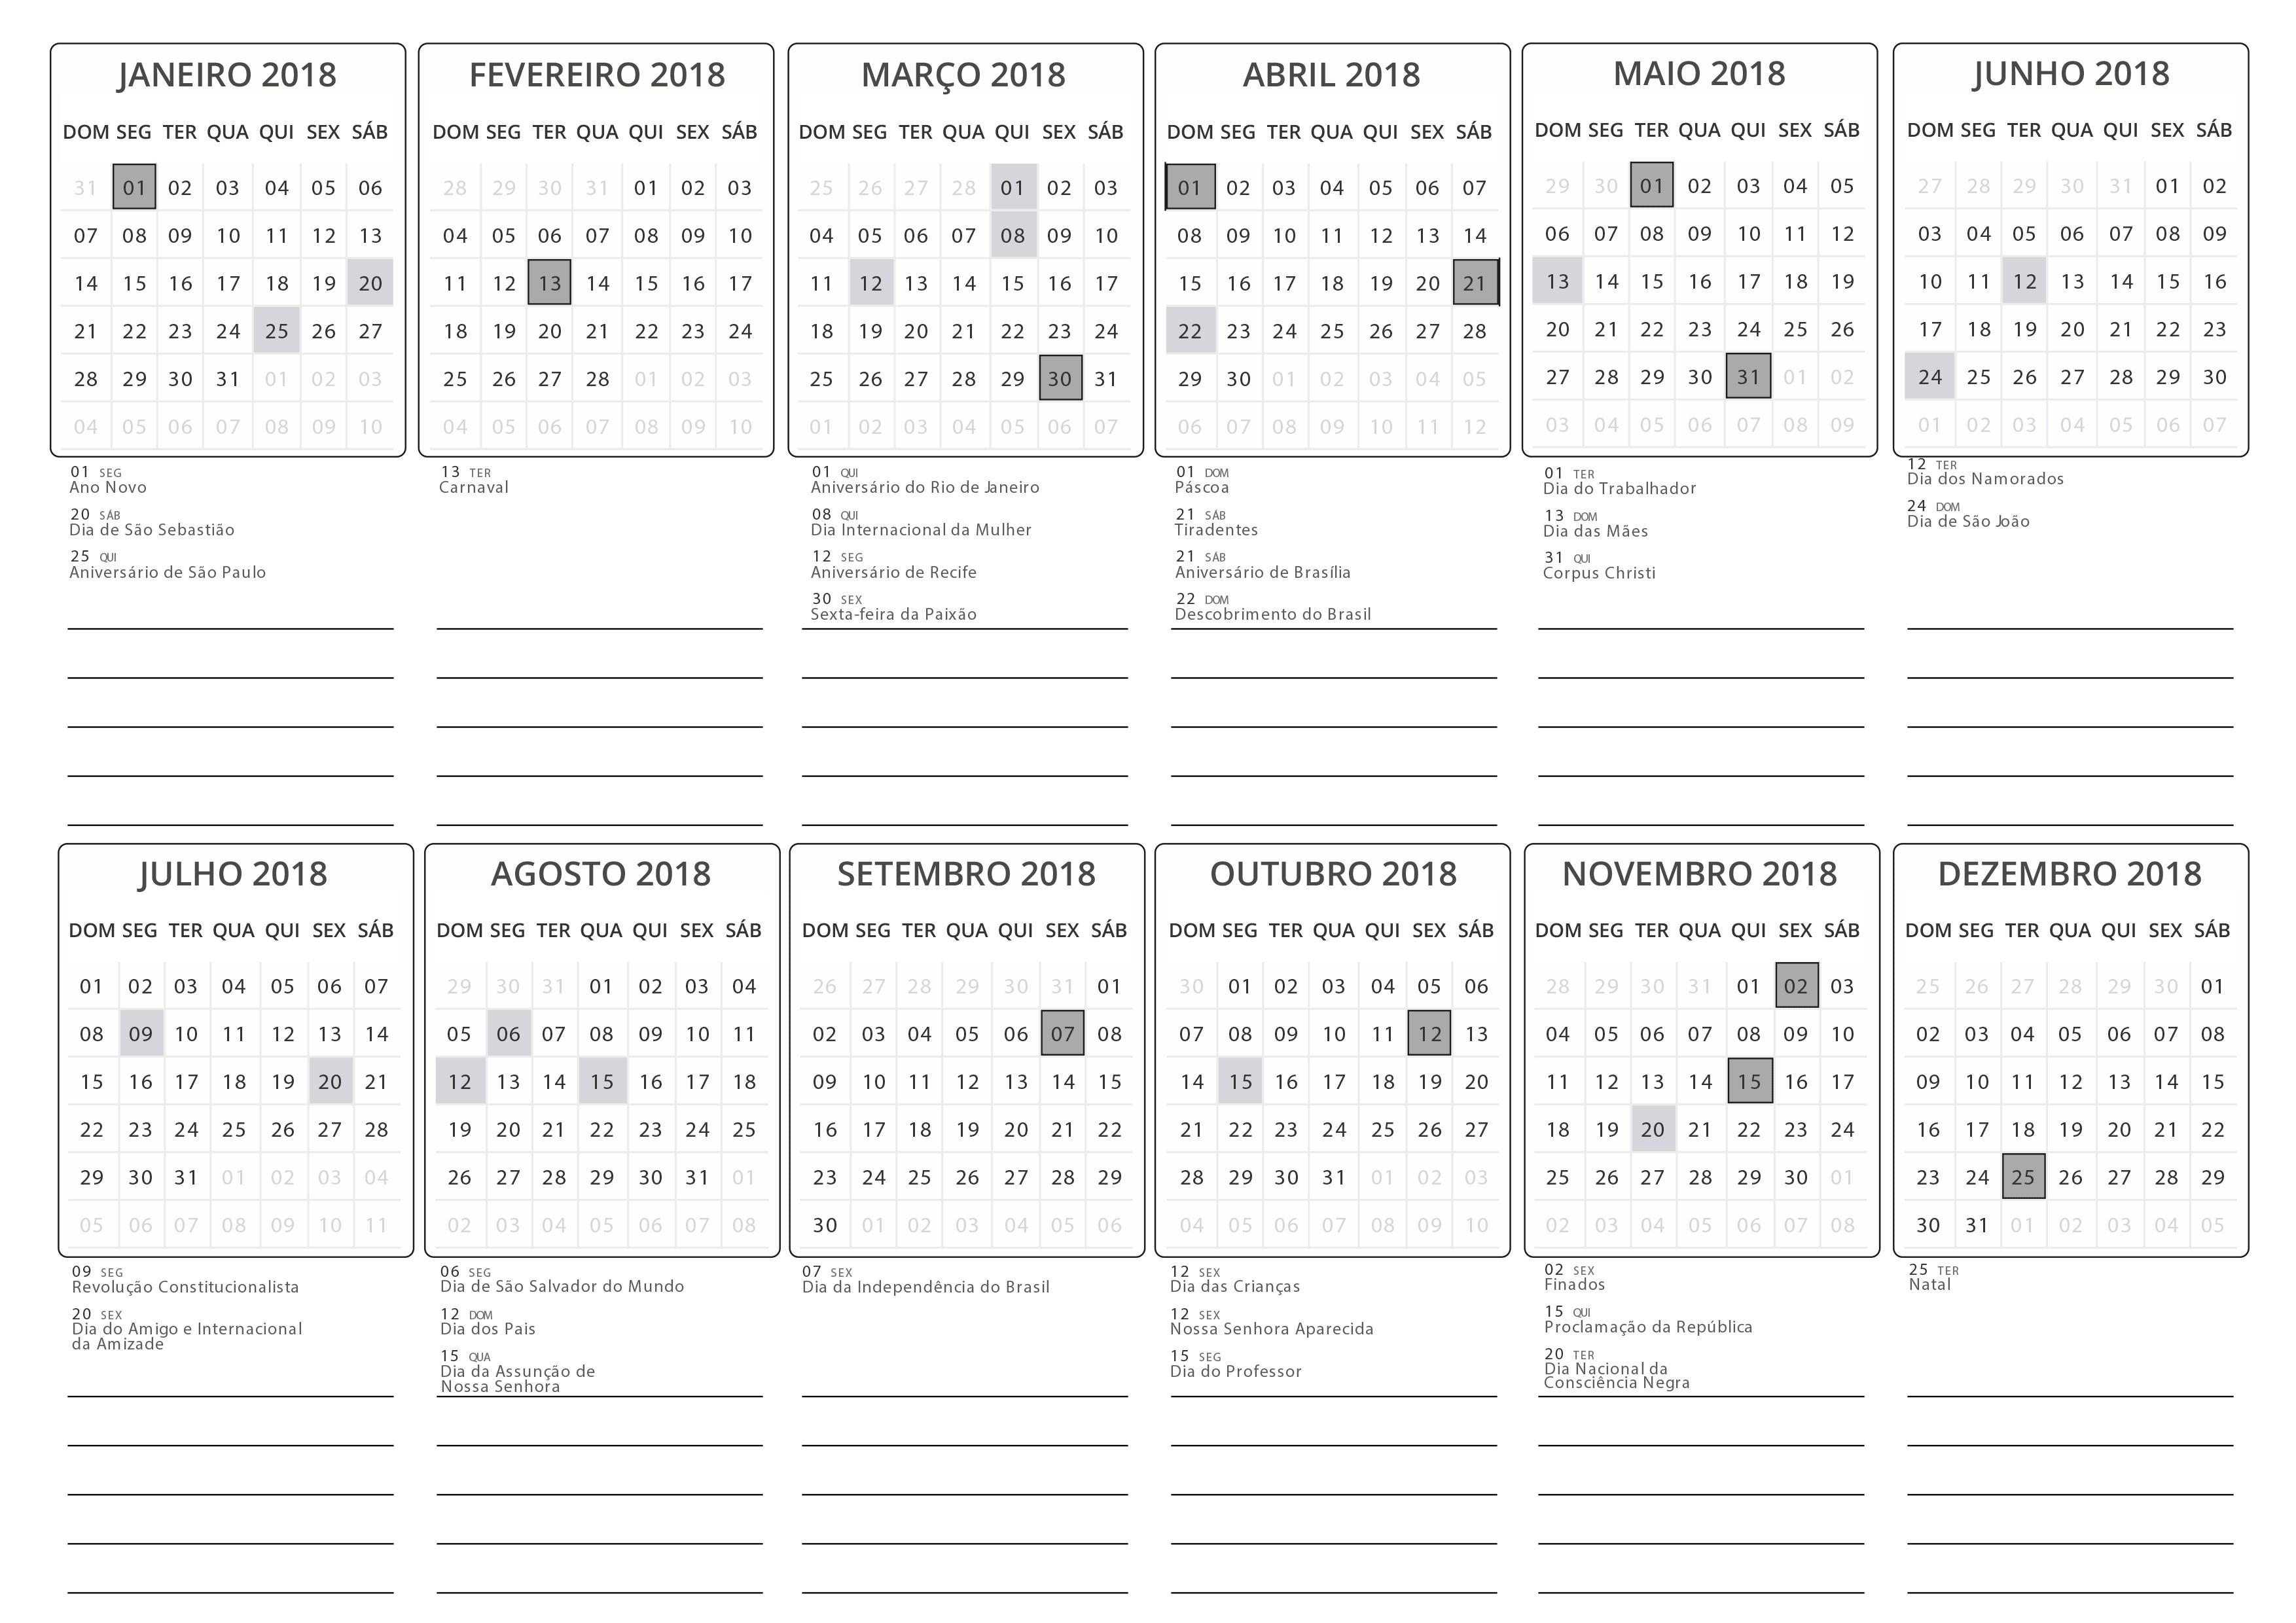 calendario imprimir novembro mas reciente keila lacerda keilalacerda07 no pinterest of calendario imprimir novembro